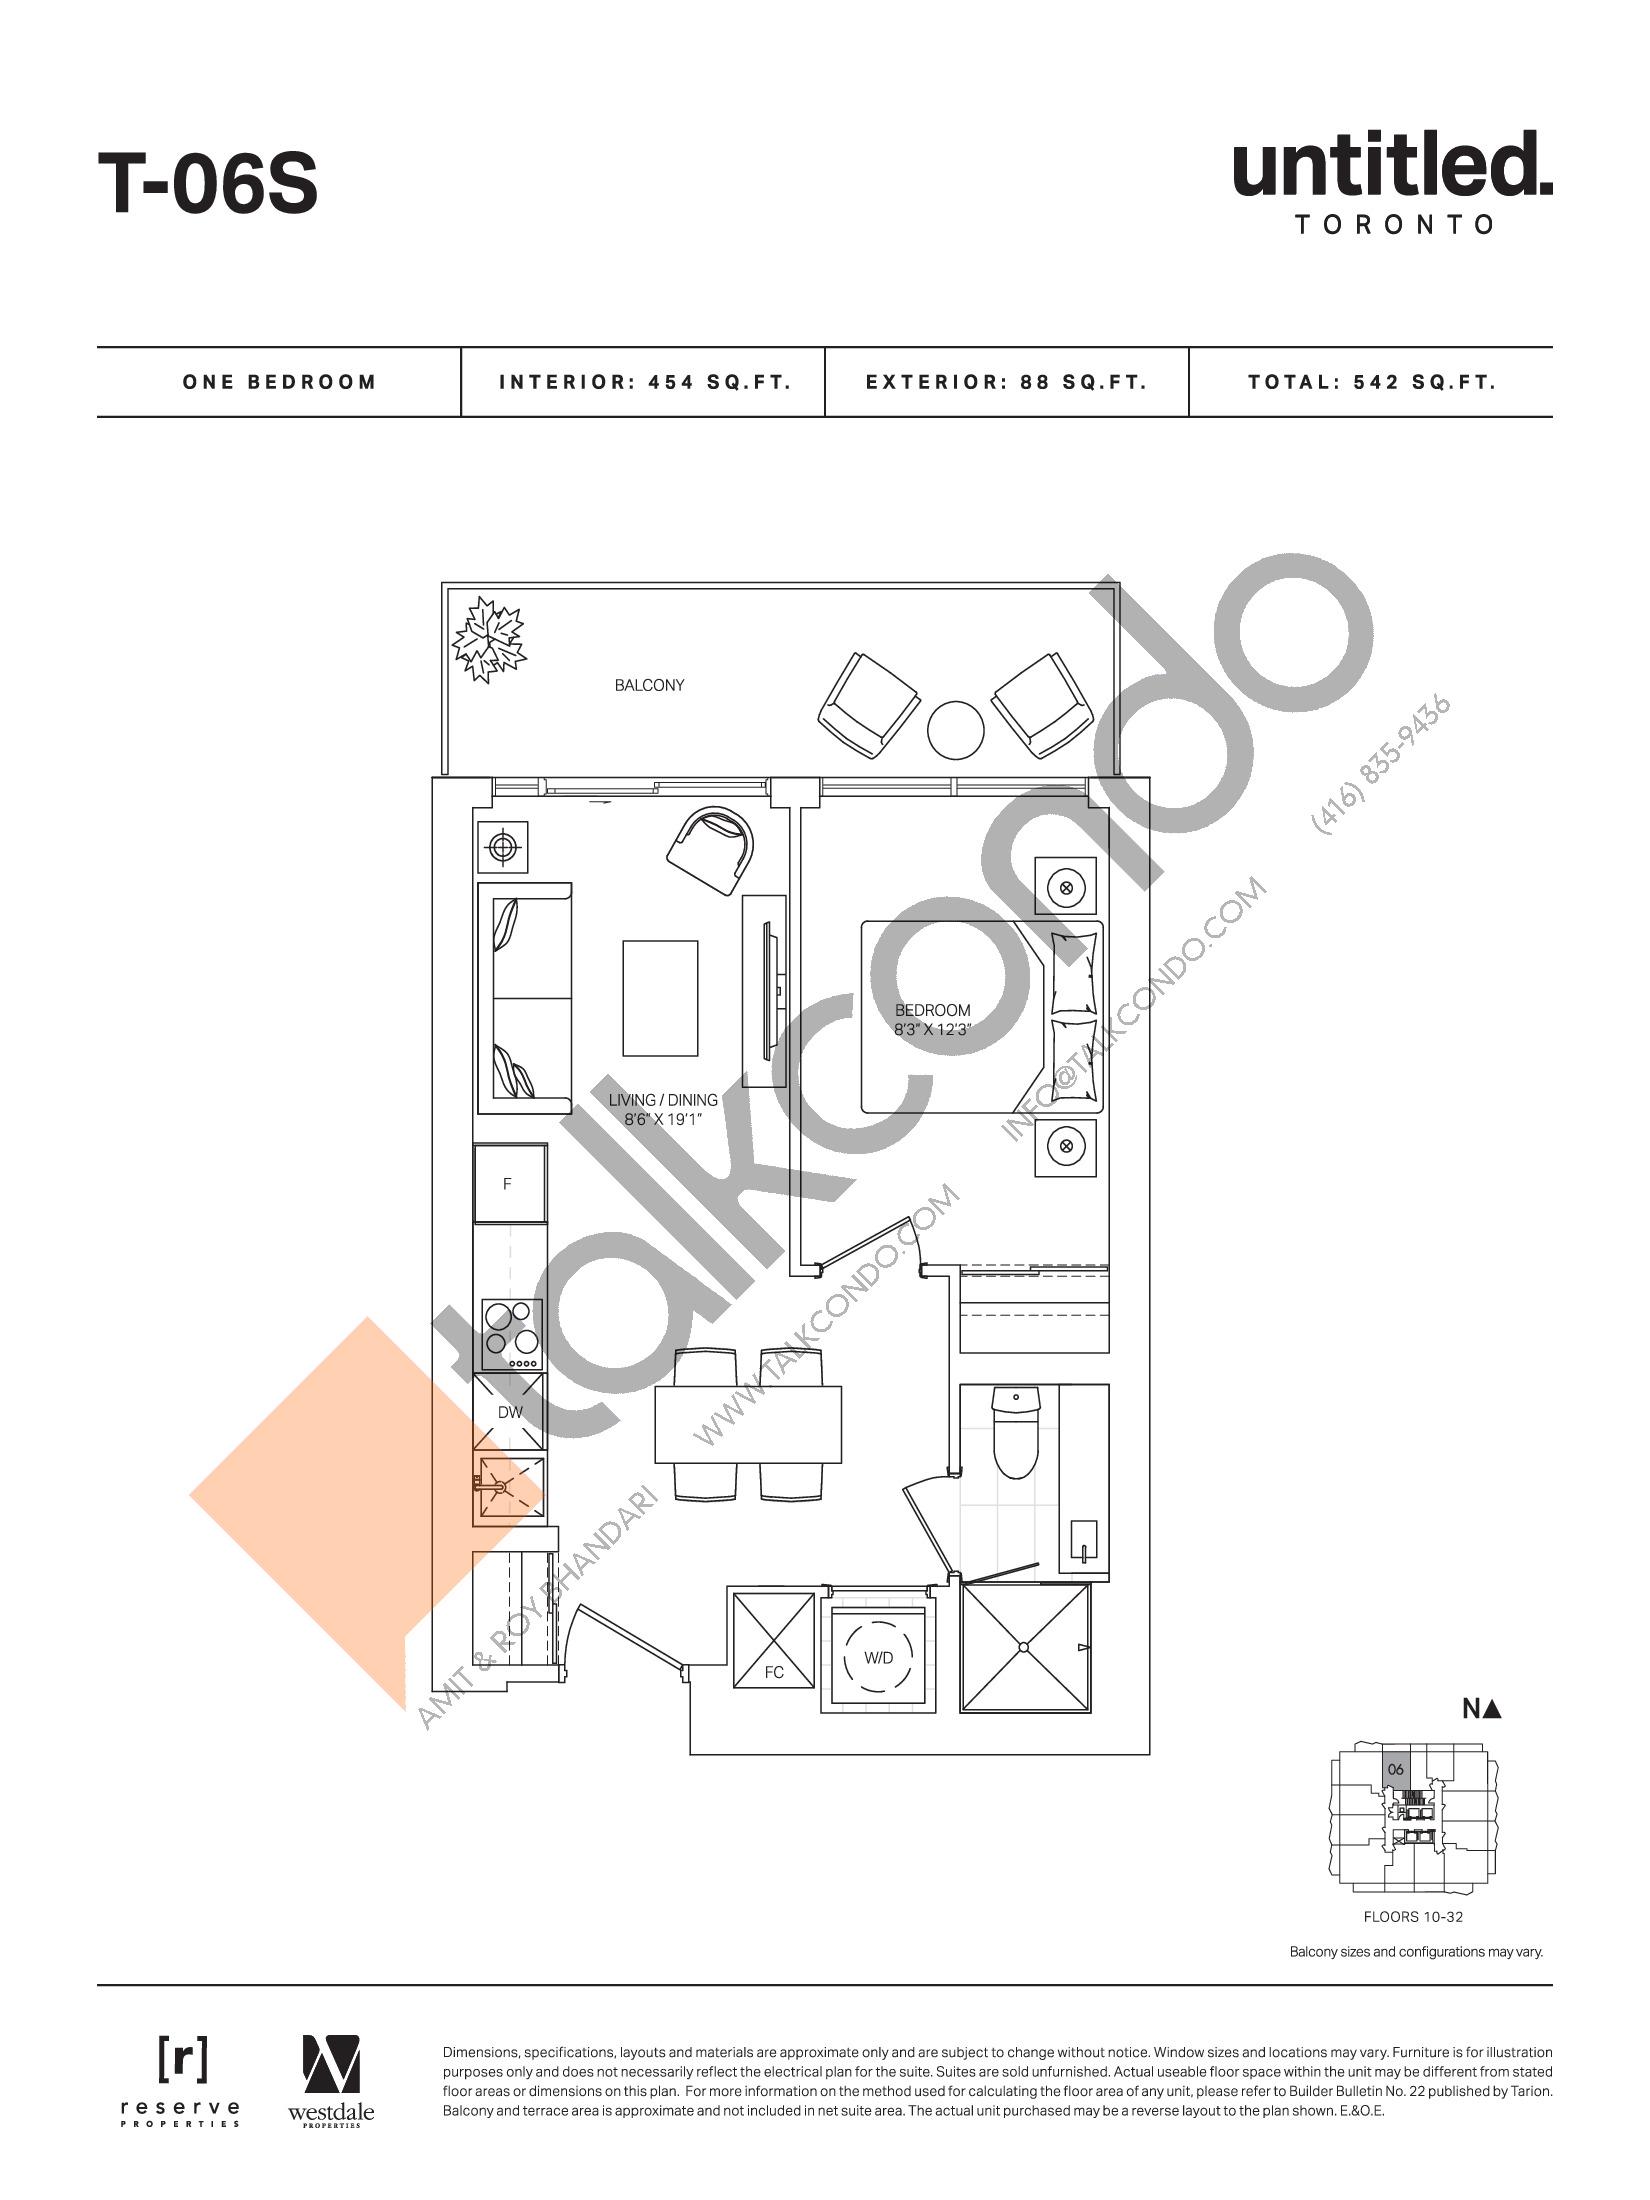 T-06S Floor Plan at Untitled Toronto Condos - 454 sq.ft